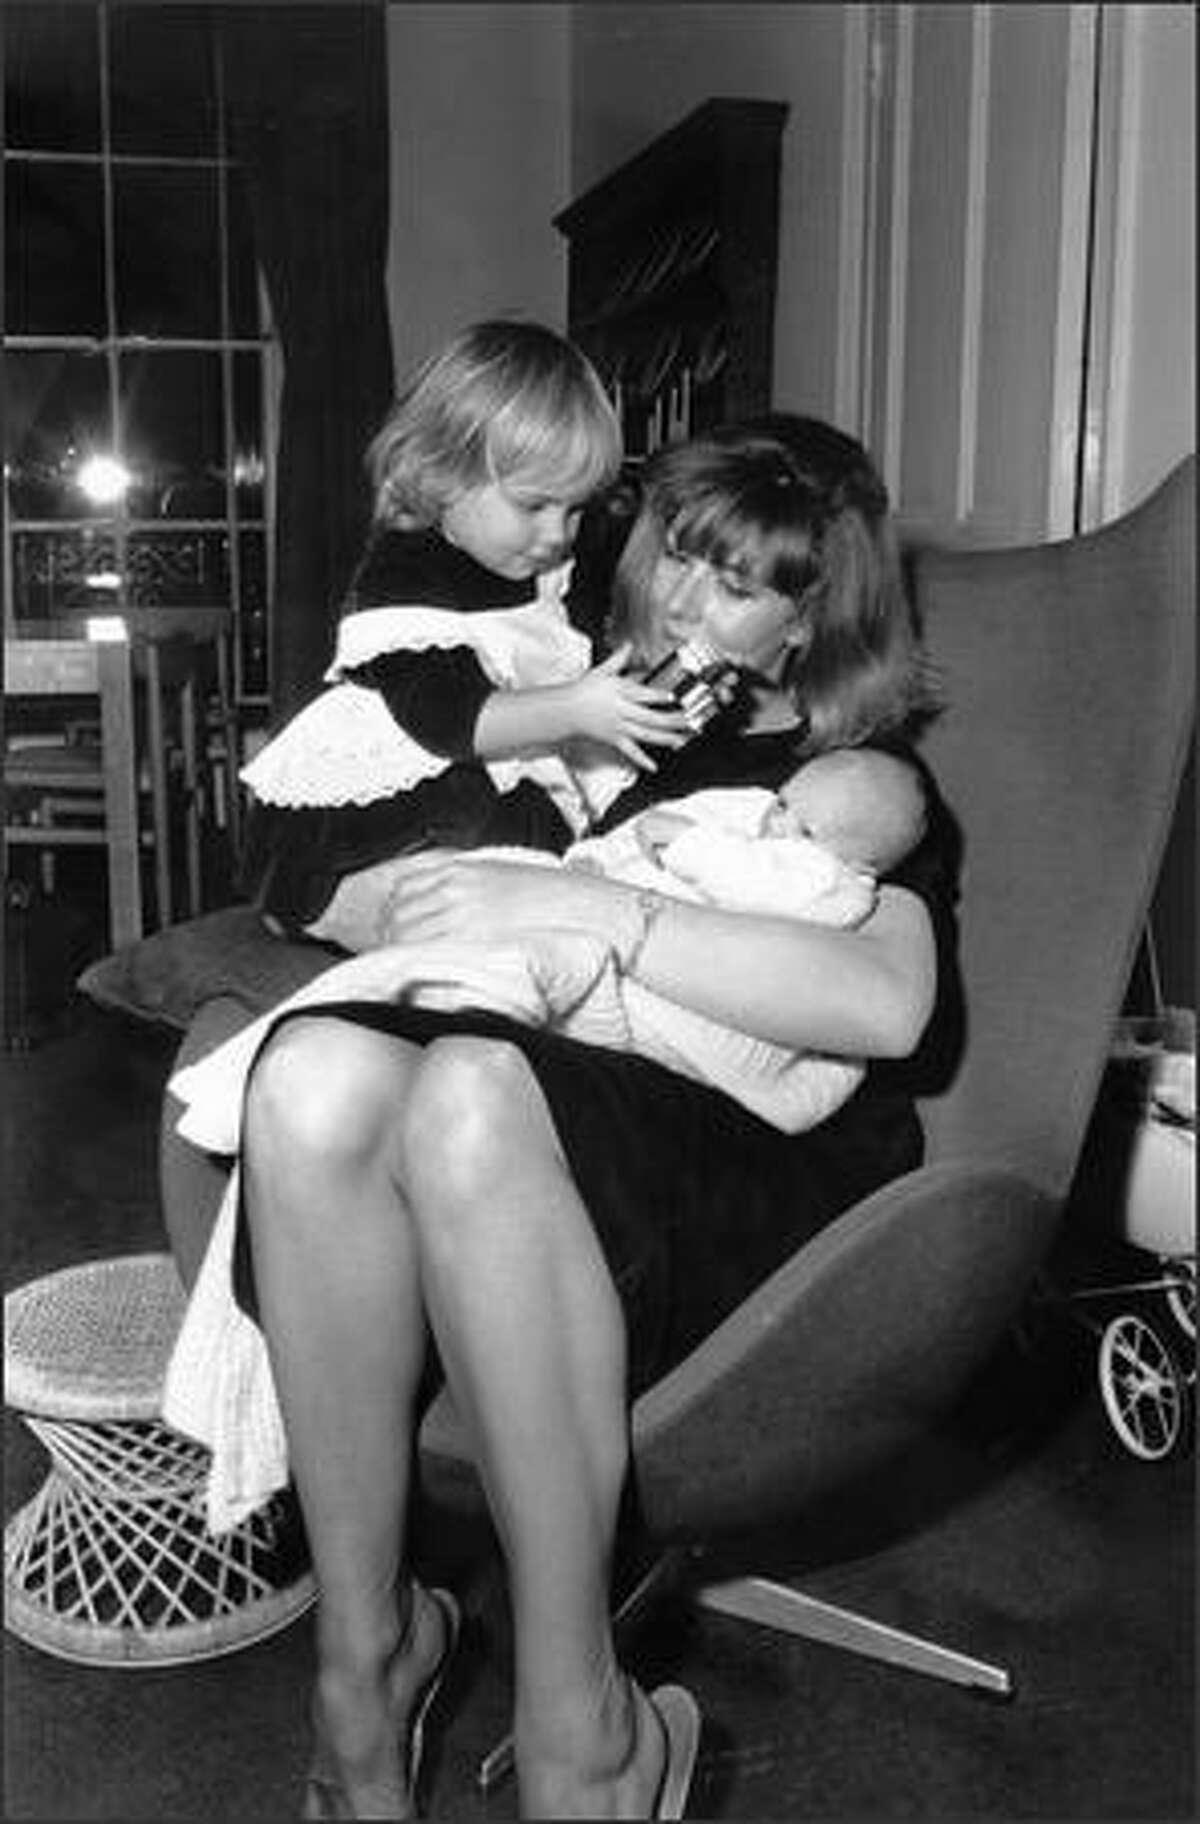 Jan. 19, 1965: English actress Vanessa Redgrave, with her children, Natasha and Joely.